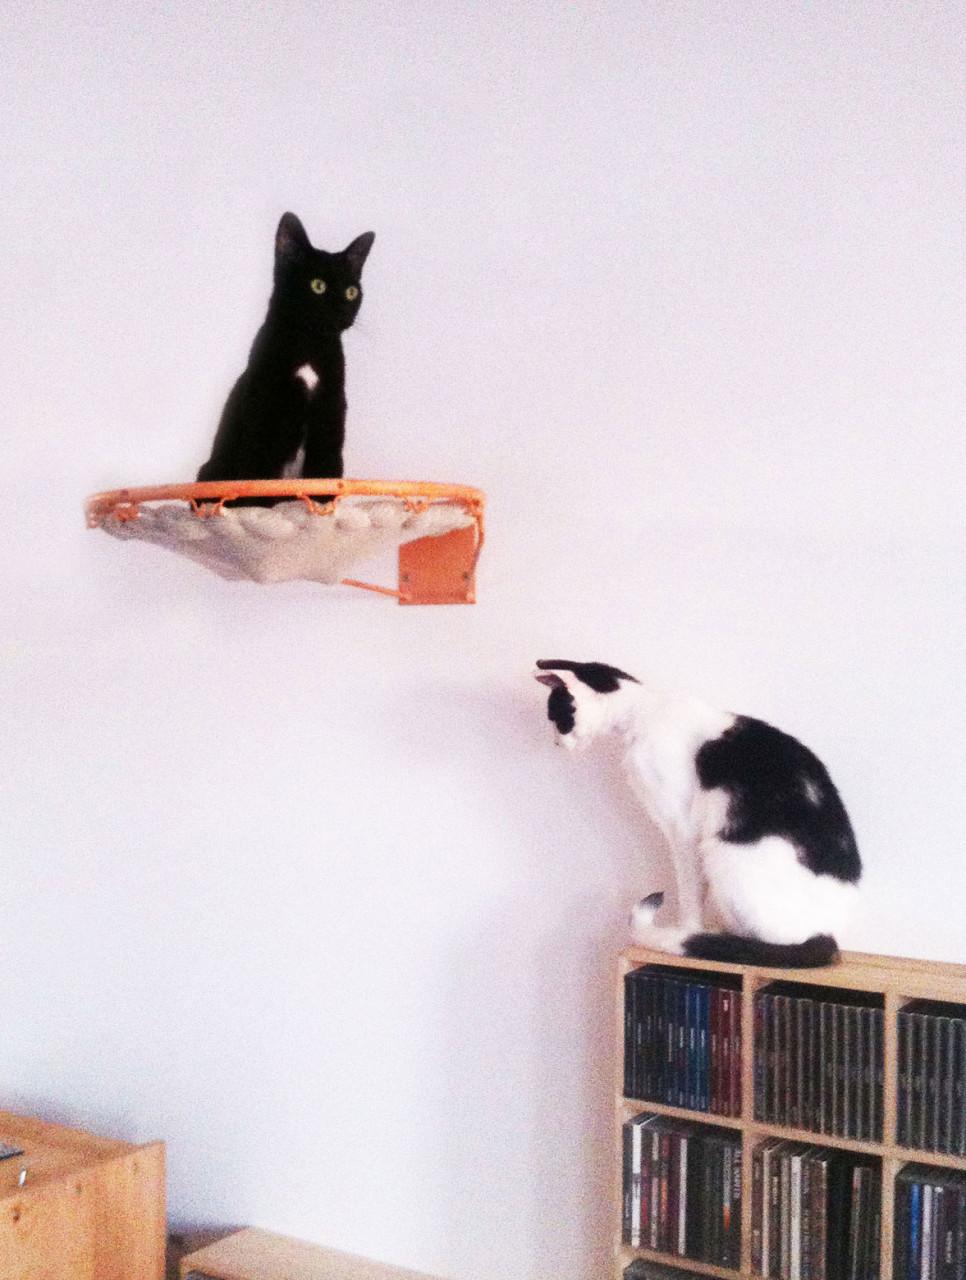 cat_basket_basketball_annienke_1